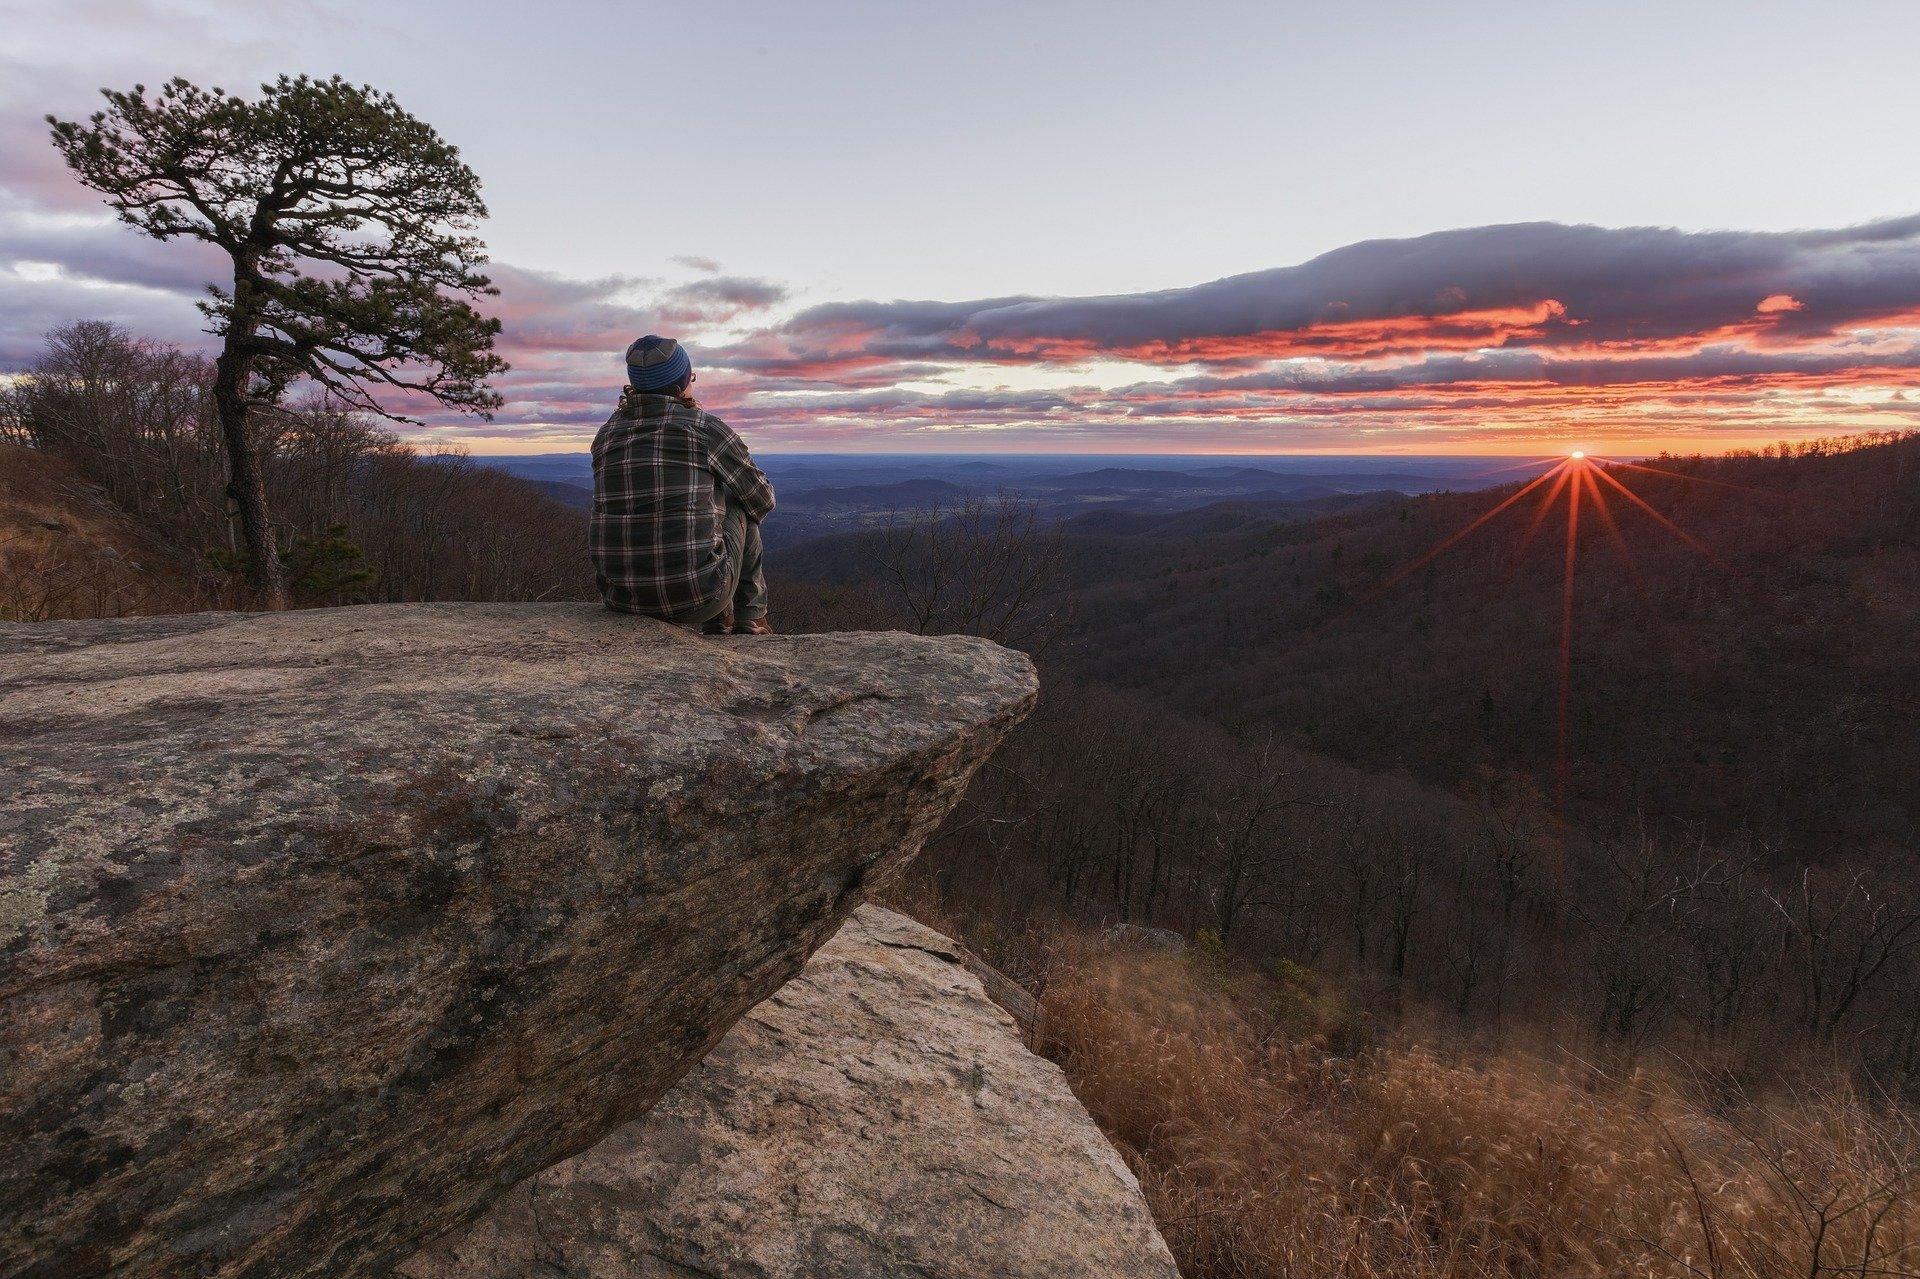 USA-Shenandoah-sunrise-2624402_1920